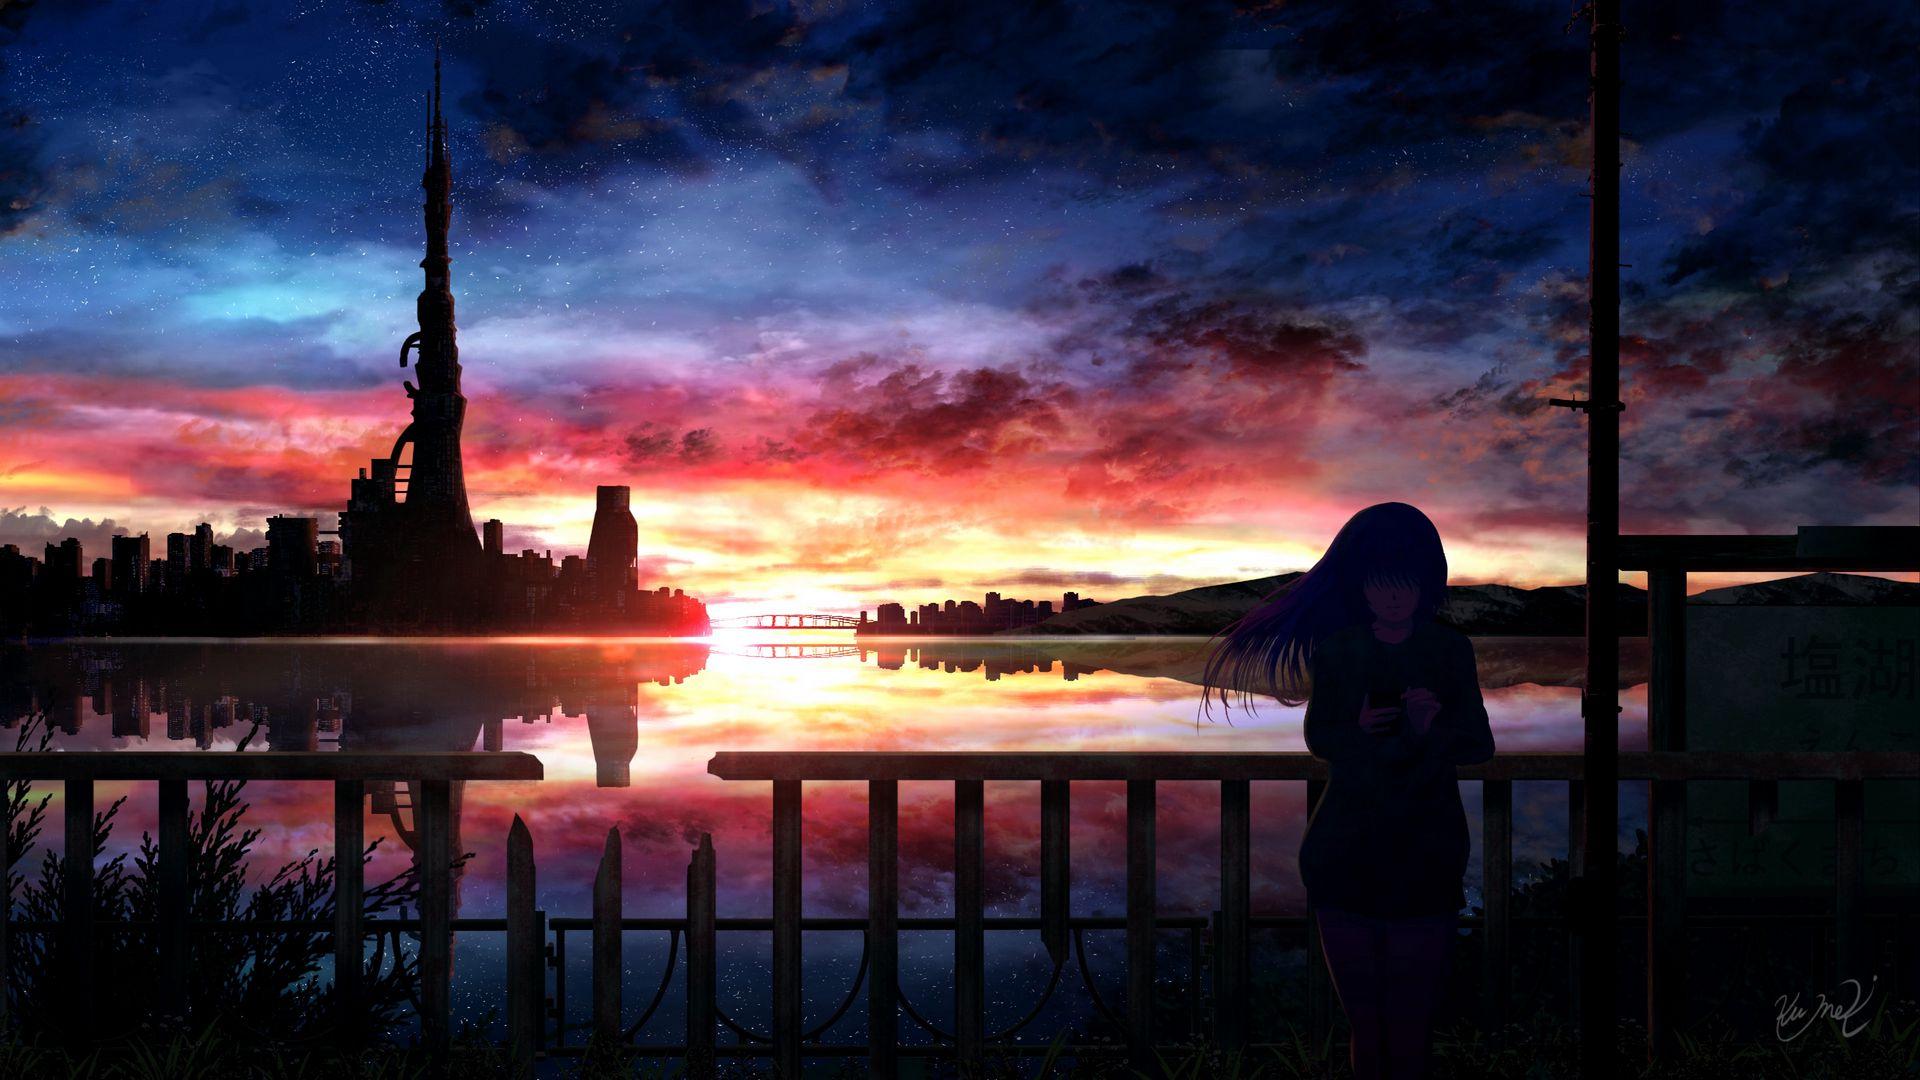 1920x1080 Wallpaper silhouette, night, starry sky, girl, anime